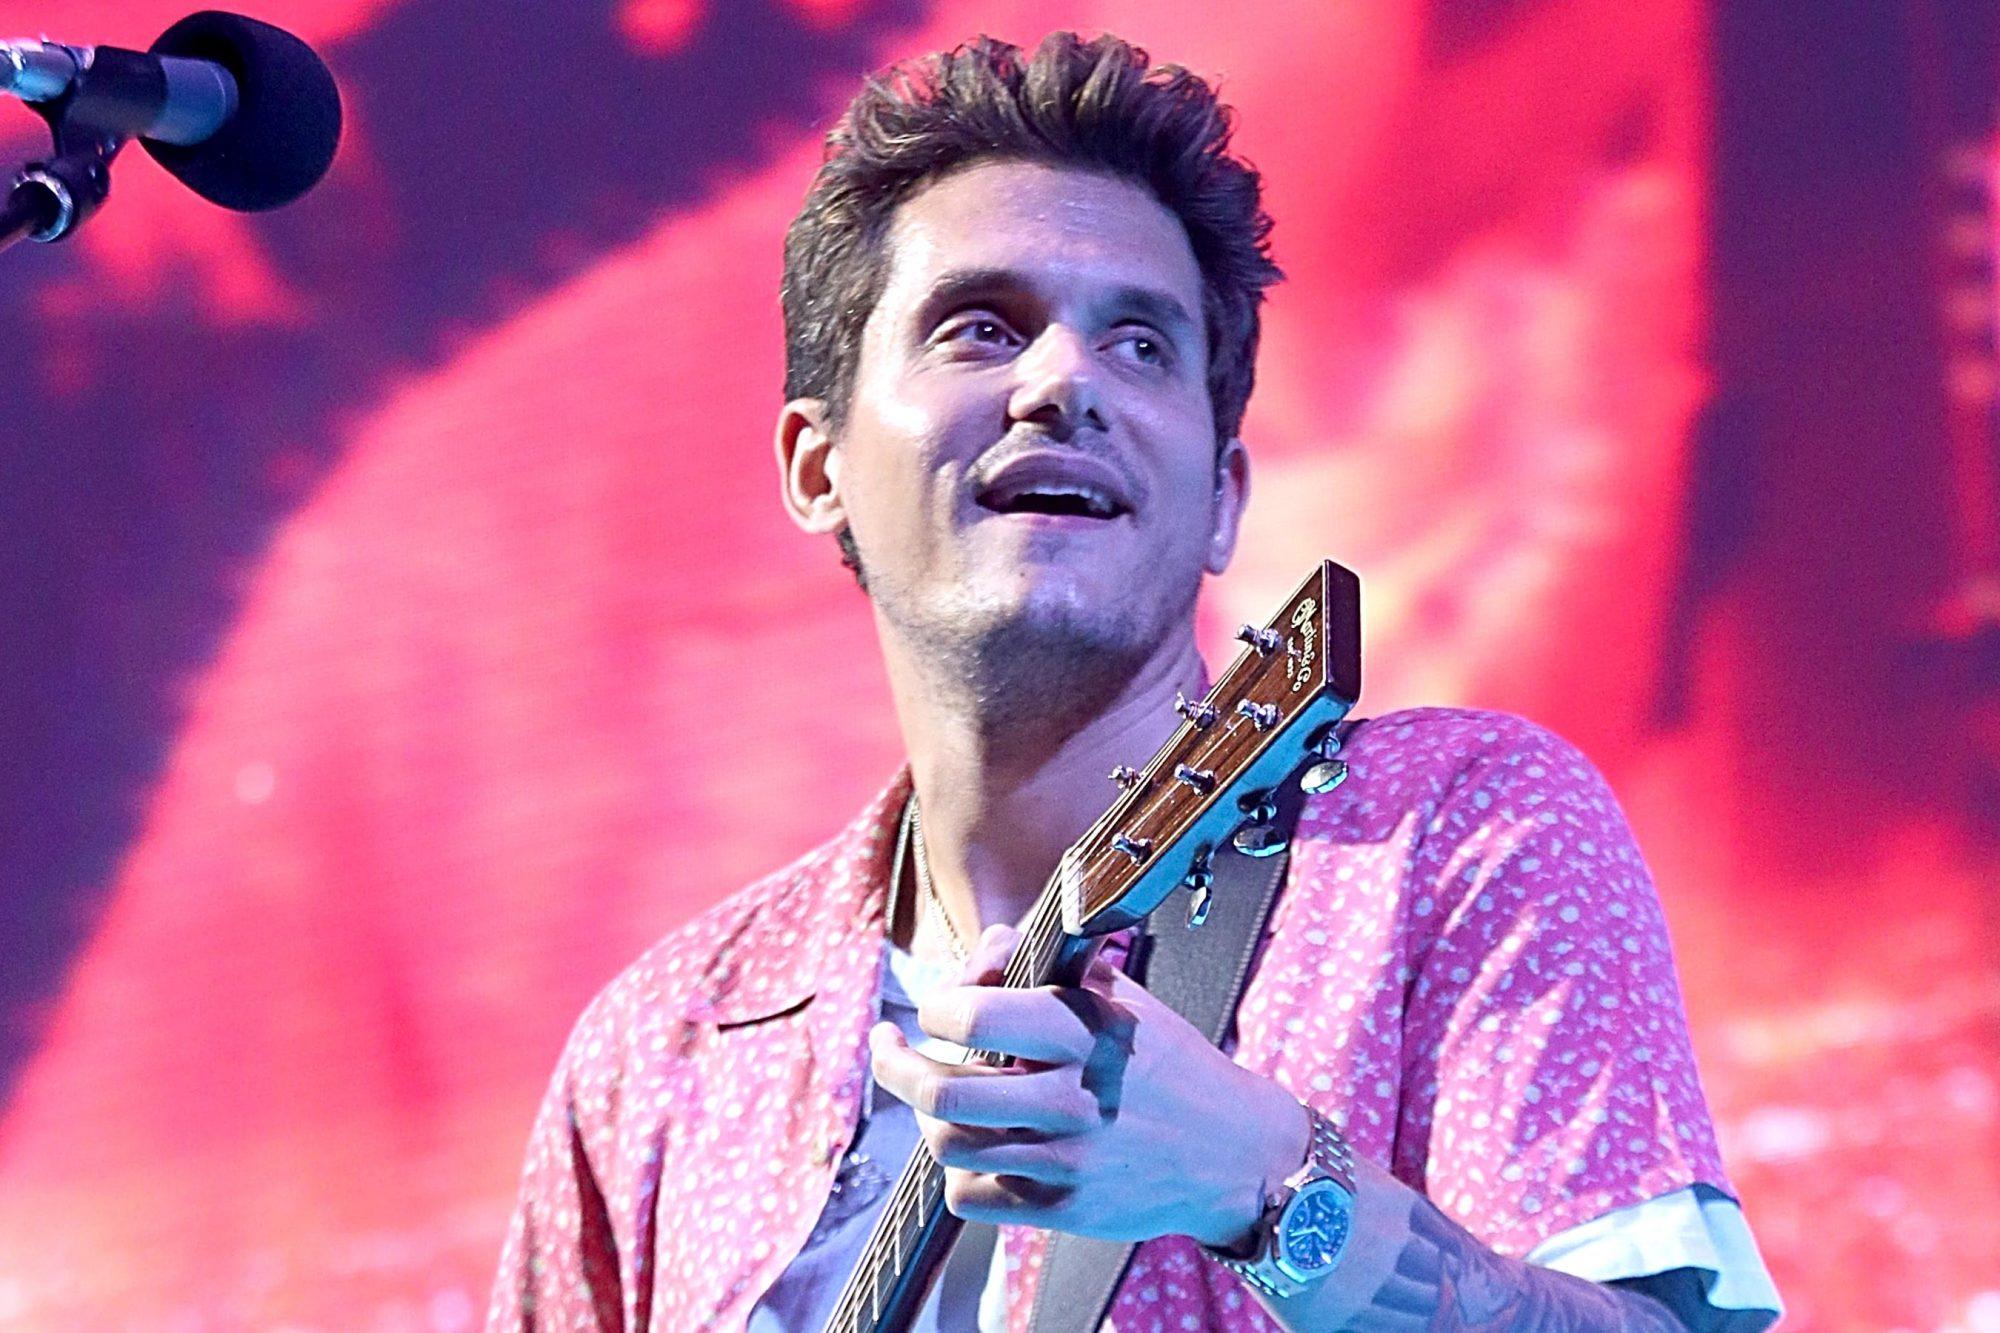 John Mayer Performs In Concert - San Antonio, TX